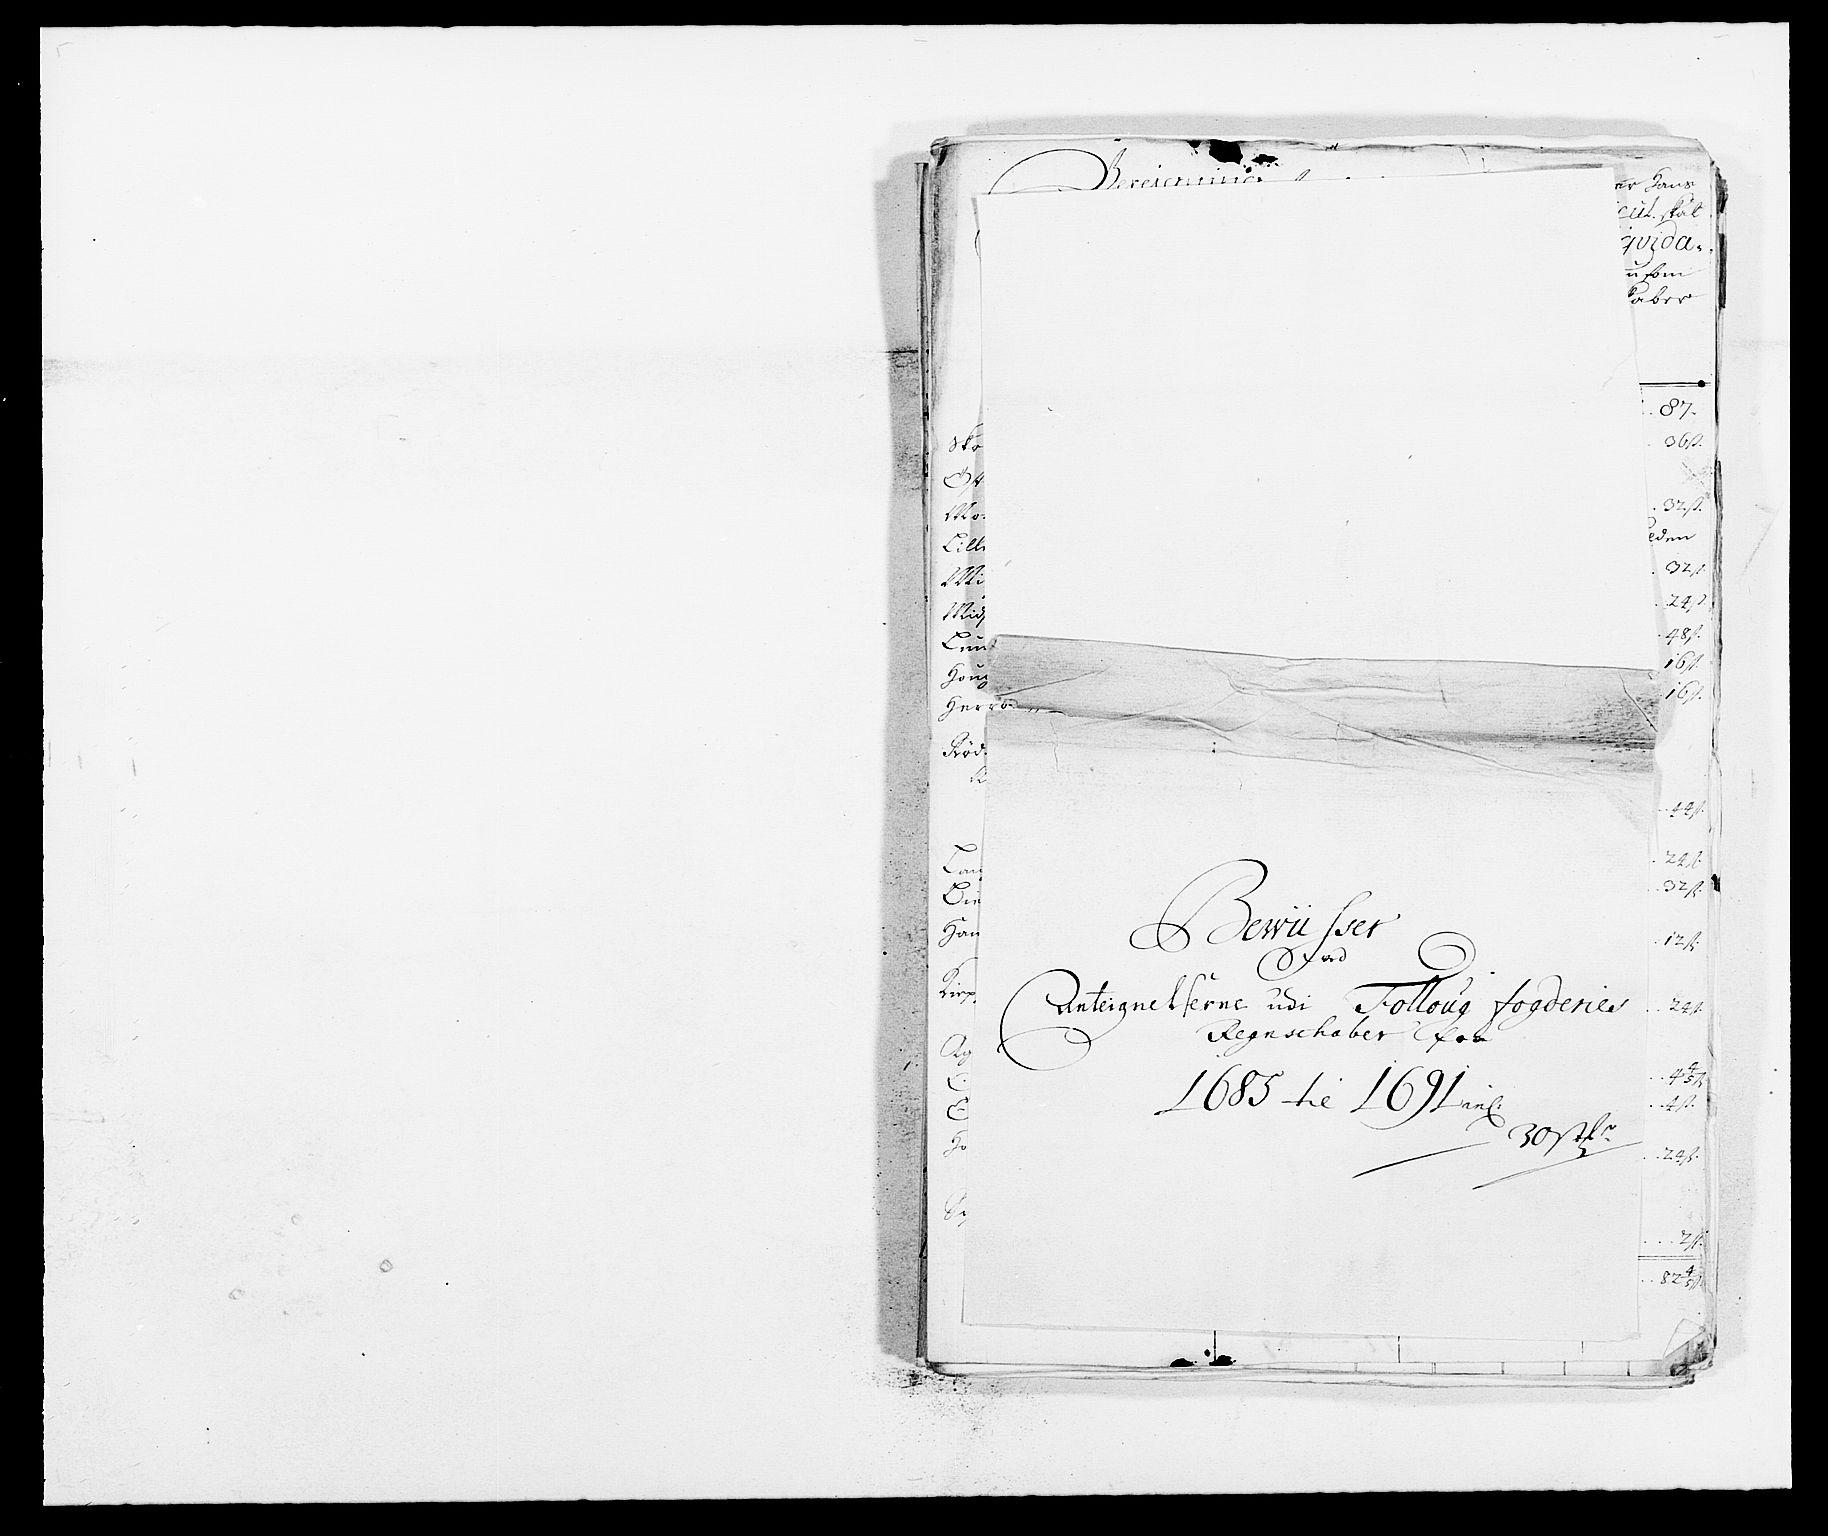 RA, Rentekammeret inntil 1814, Reviderte regnskaper, Fogderegnskap, R09/L0436: Fogderegnskap Follo, 1685-1691, s. 336